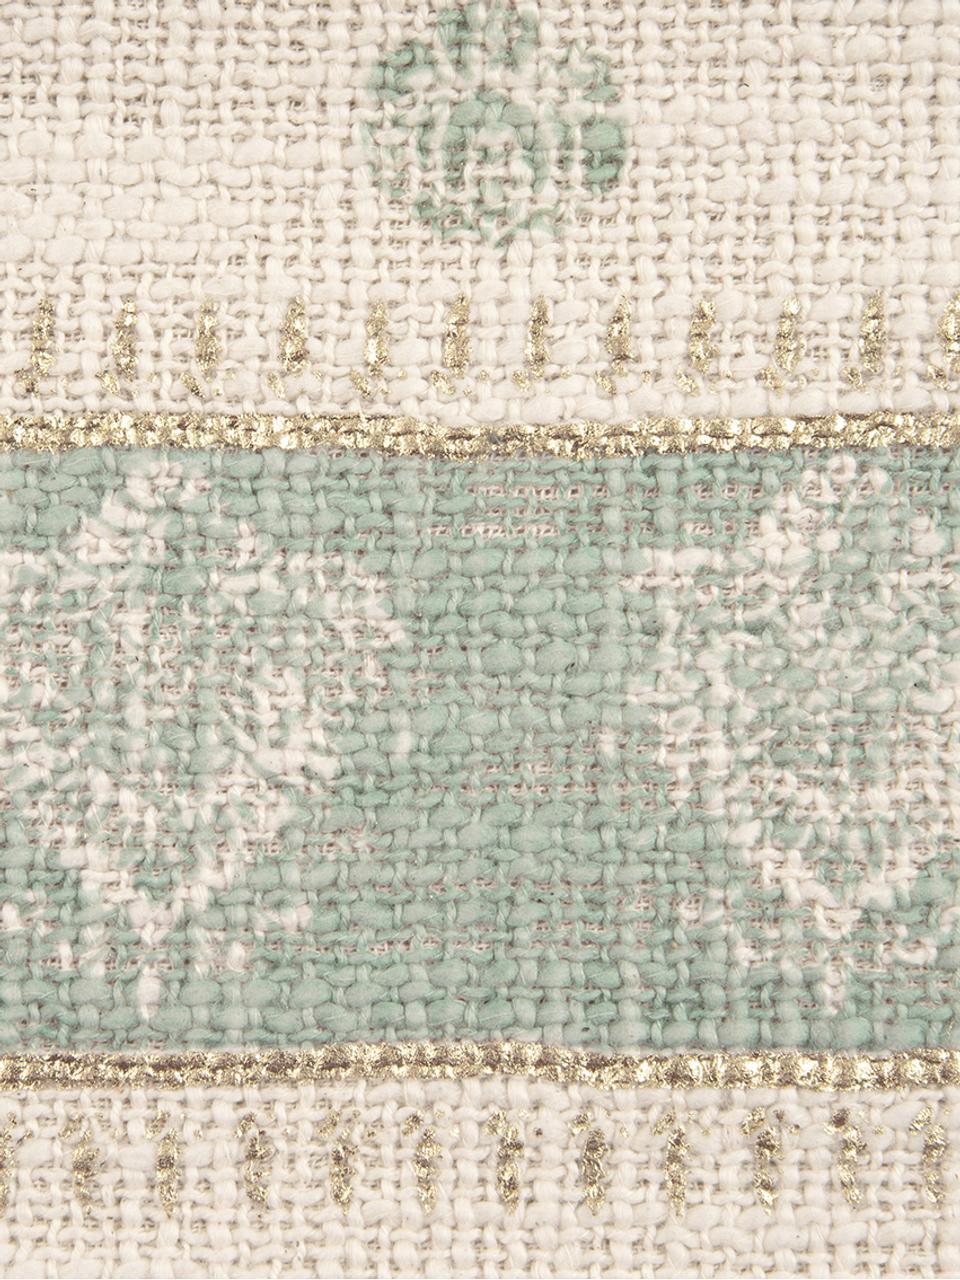 Federa arredo con nappe Jasmine, 100% cotone, Beige, verde menta, dorato, Larg. 30 x Lung. 50 cm